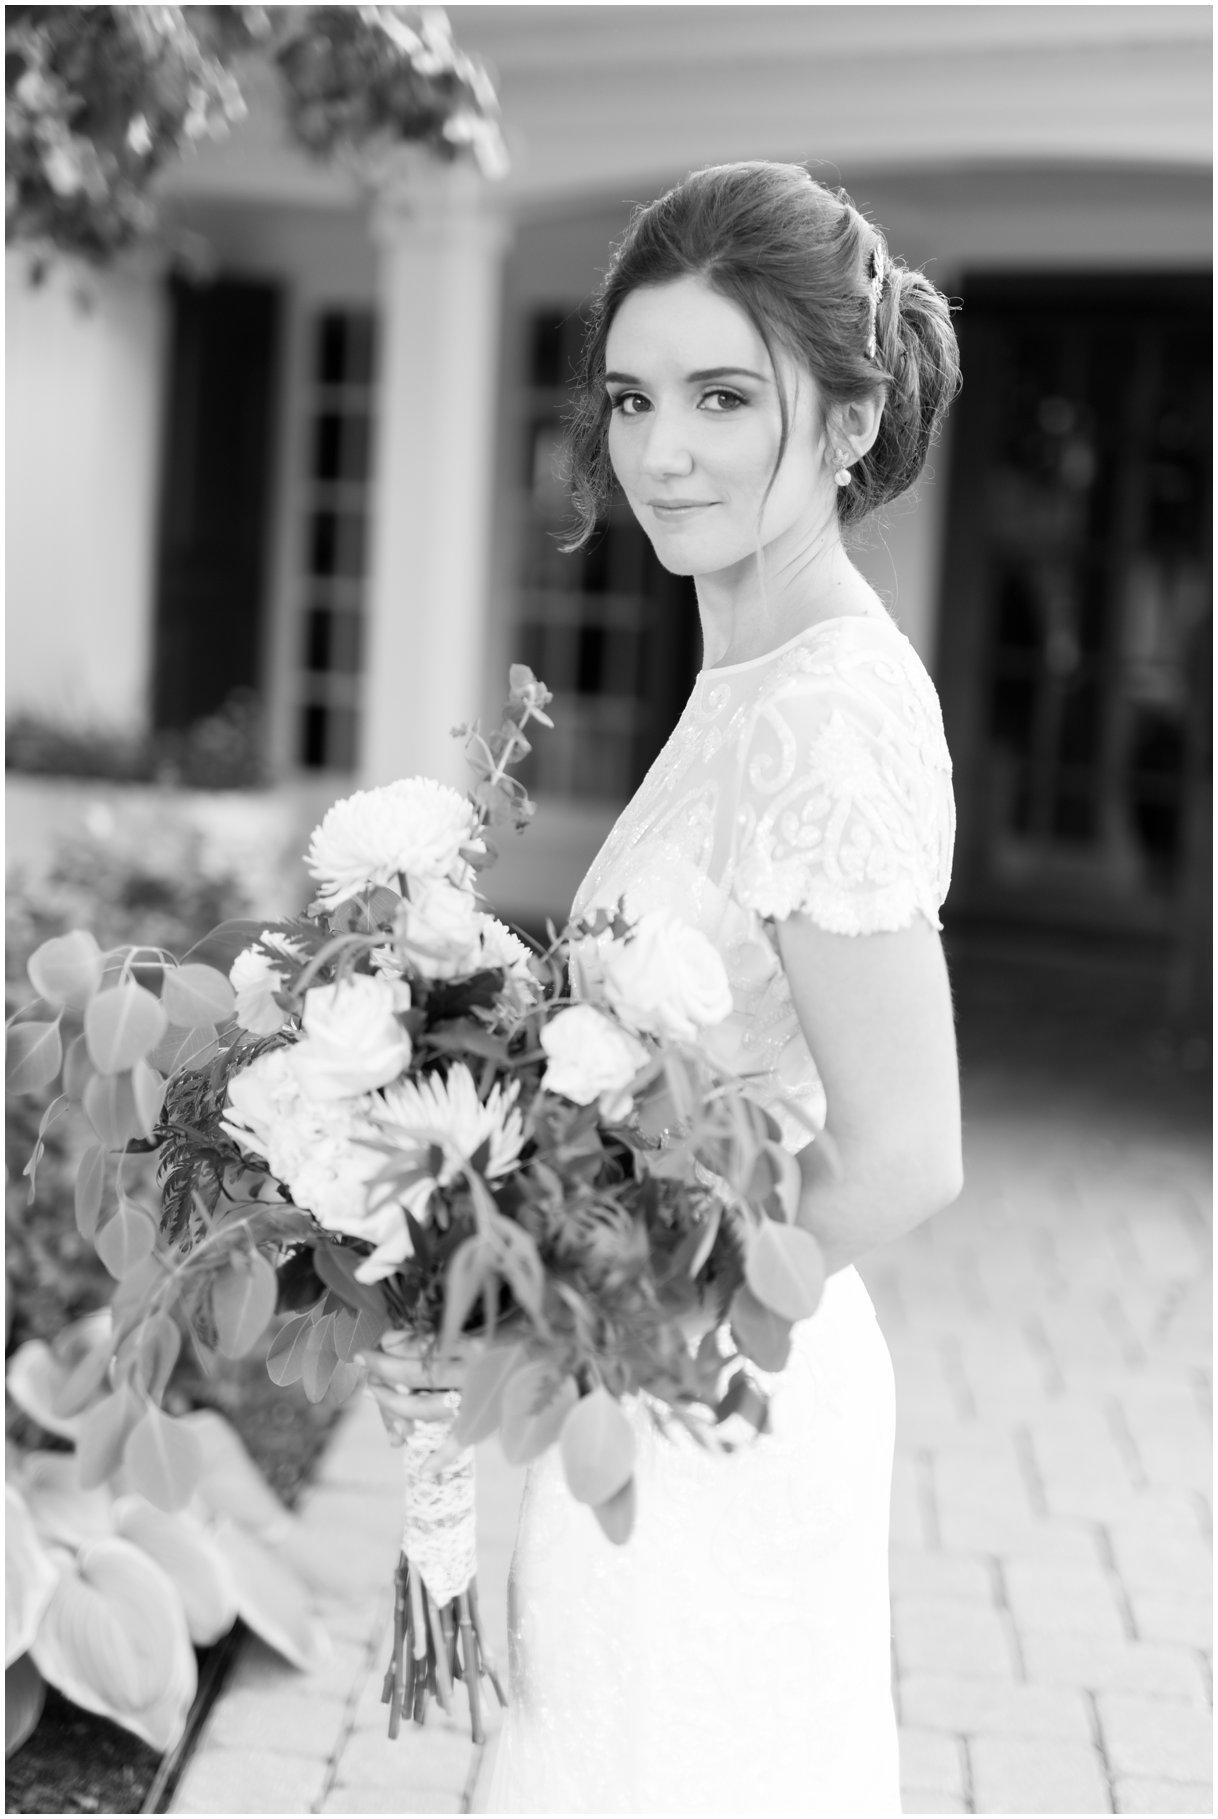 leolainn-lancasterwedding-photographer-photography-outdoor-wedding-dress-photo